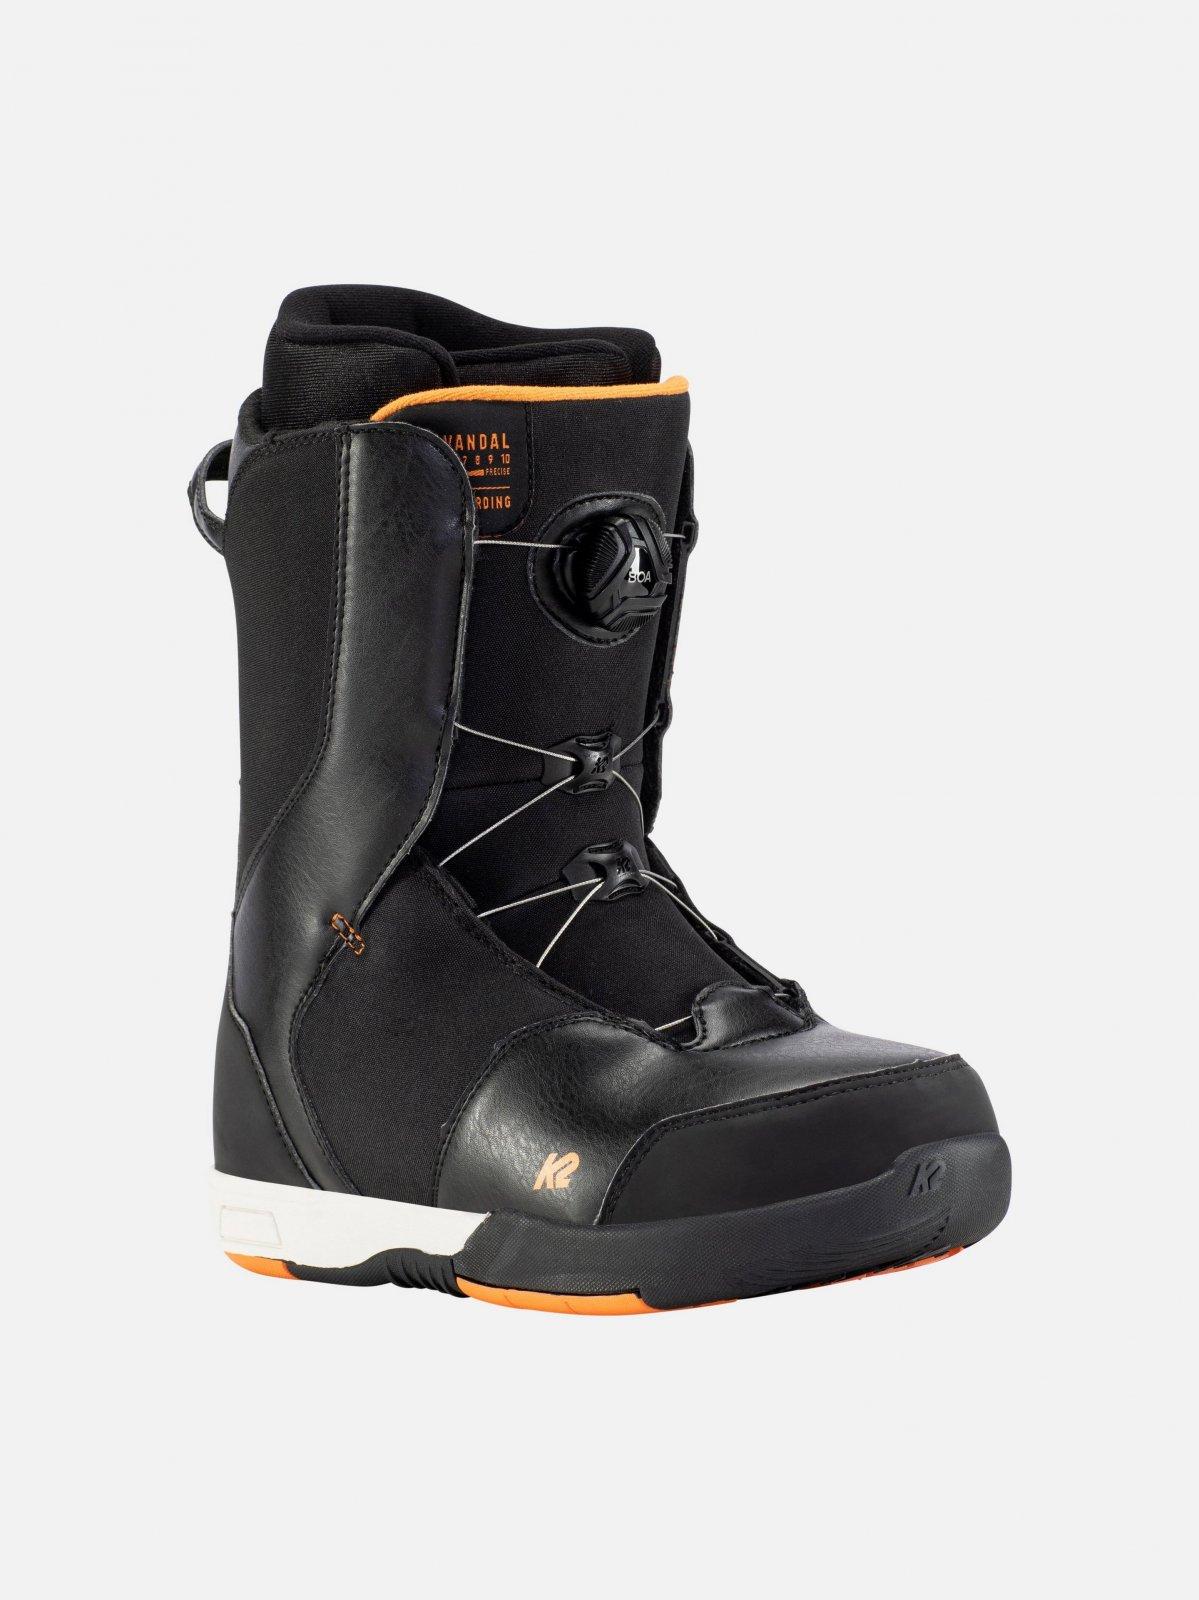 2021 K2 Vandal Snowboard Boots